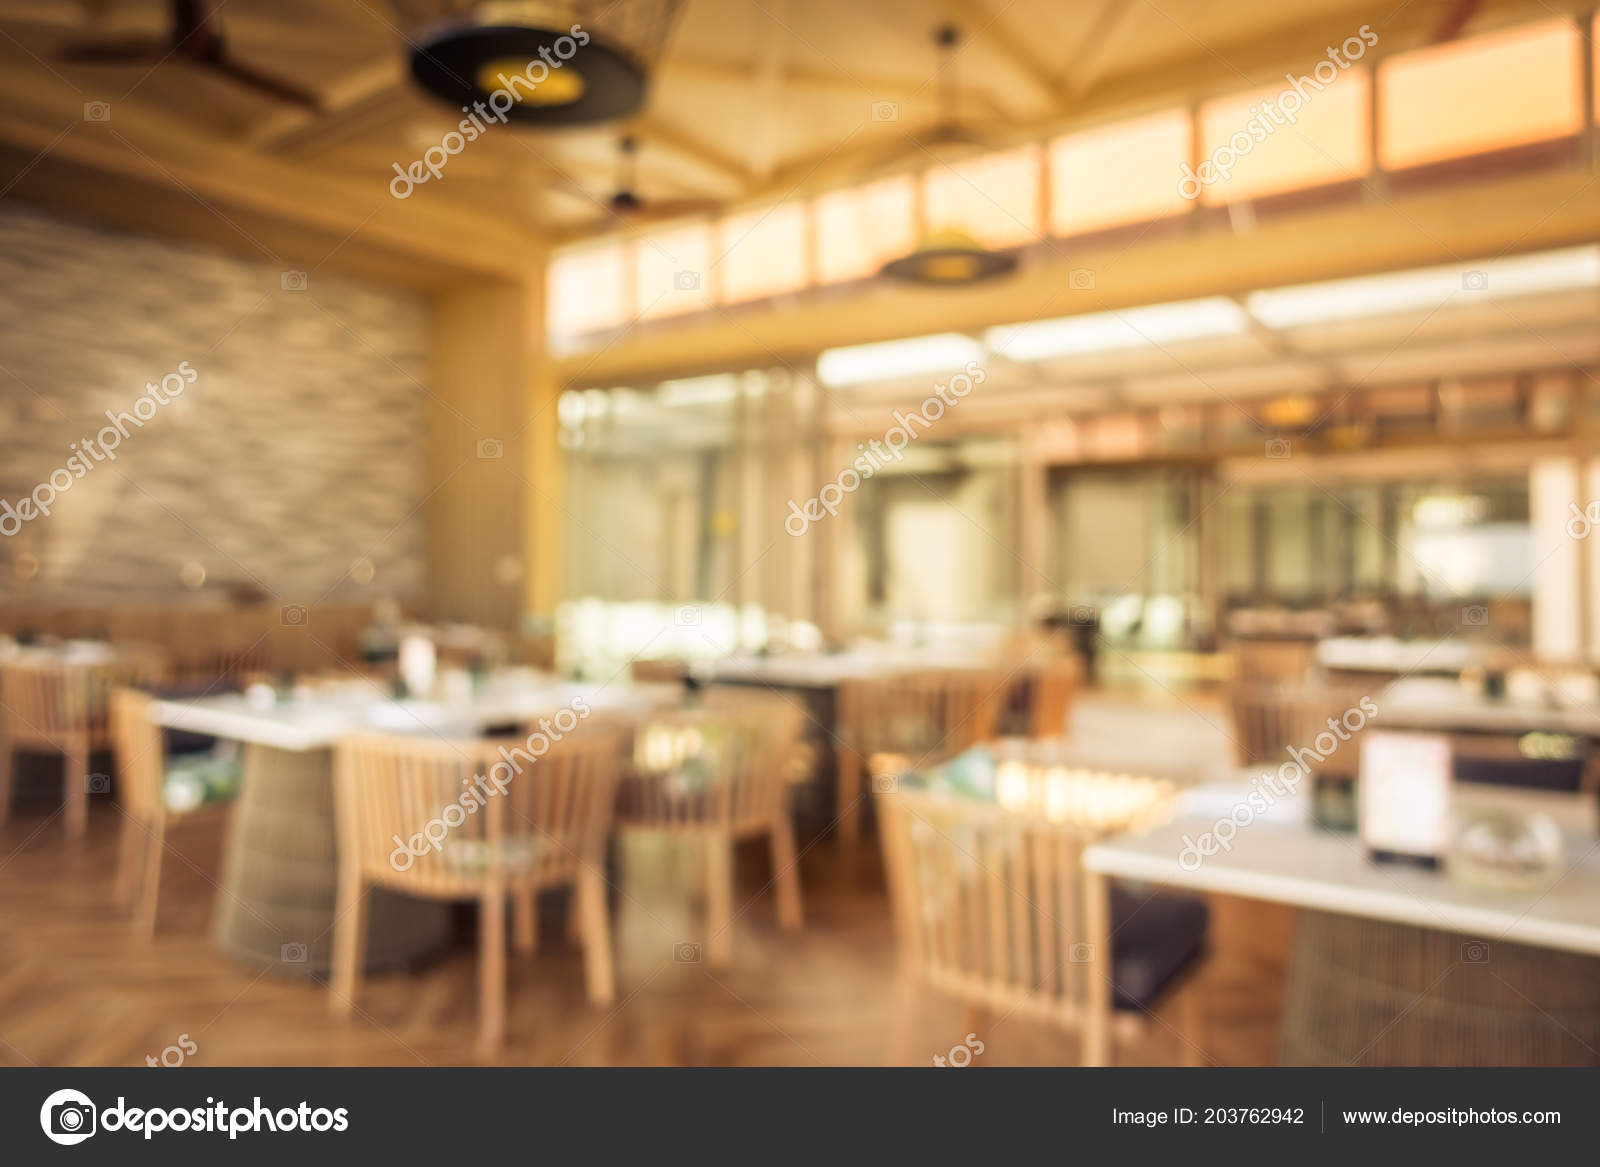 Abstract Blur Defocused Restaurant Buffet Hotel Resort Background Stock Photo C Mrsiraphol 203762942